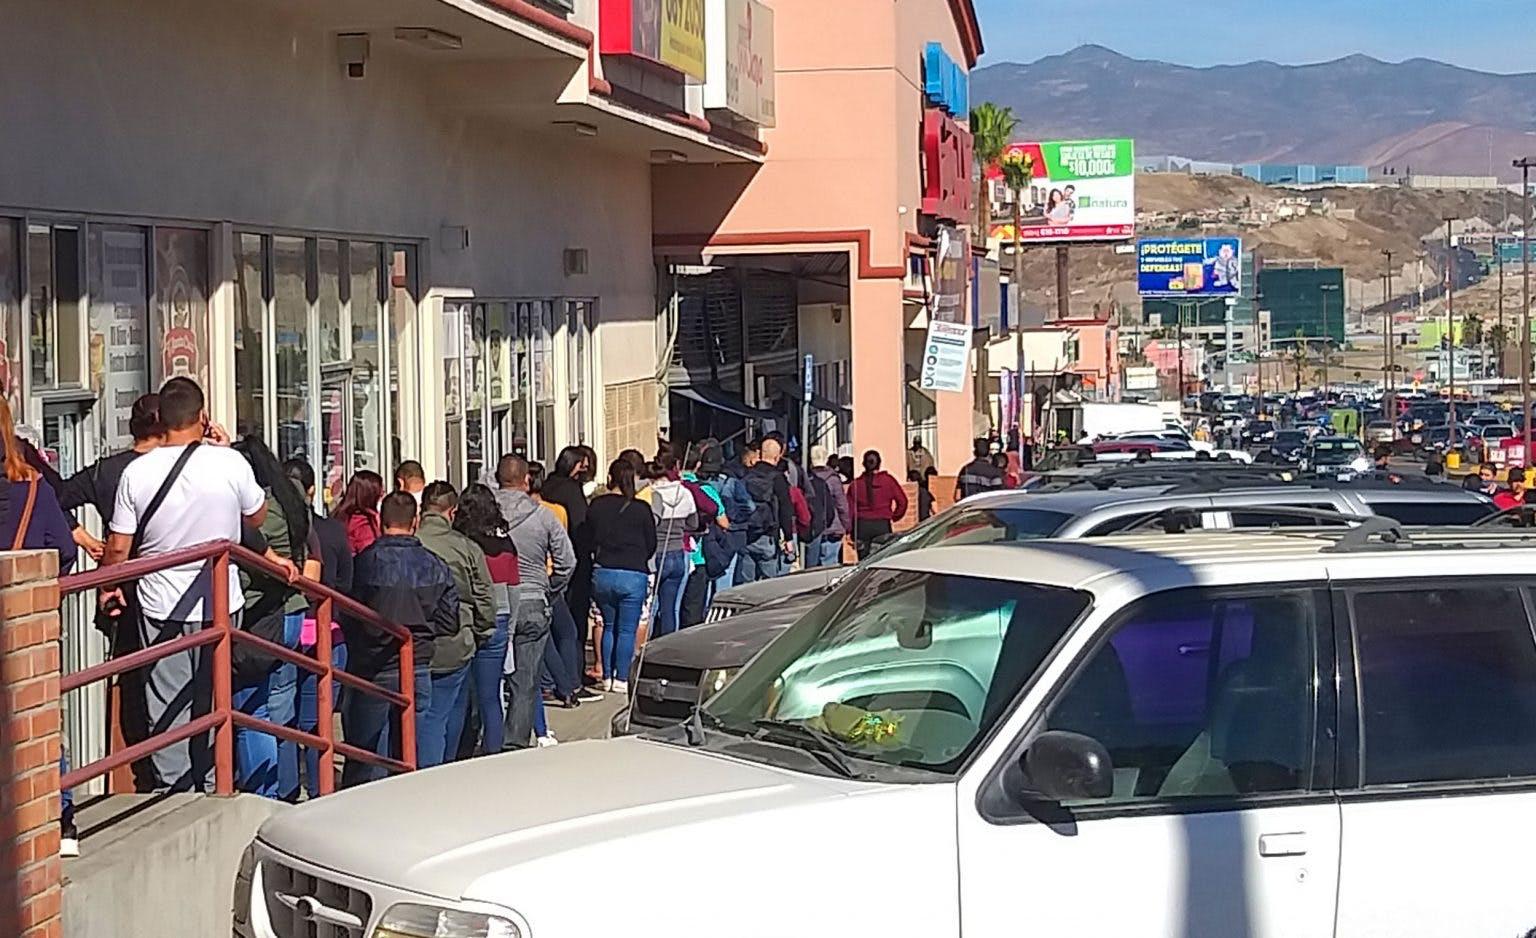 Tijuana, movilidad, Baja California, Covid-19, pandemia